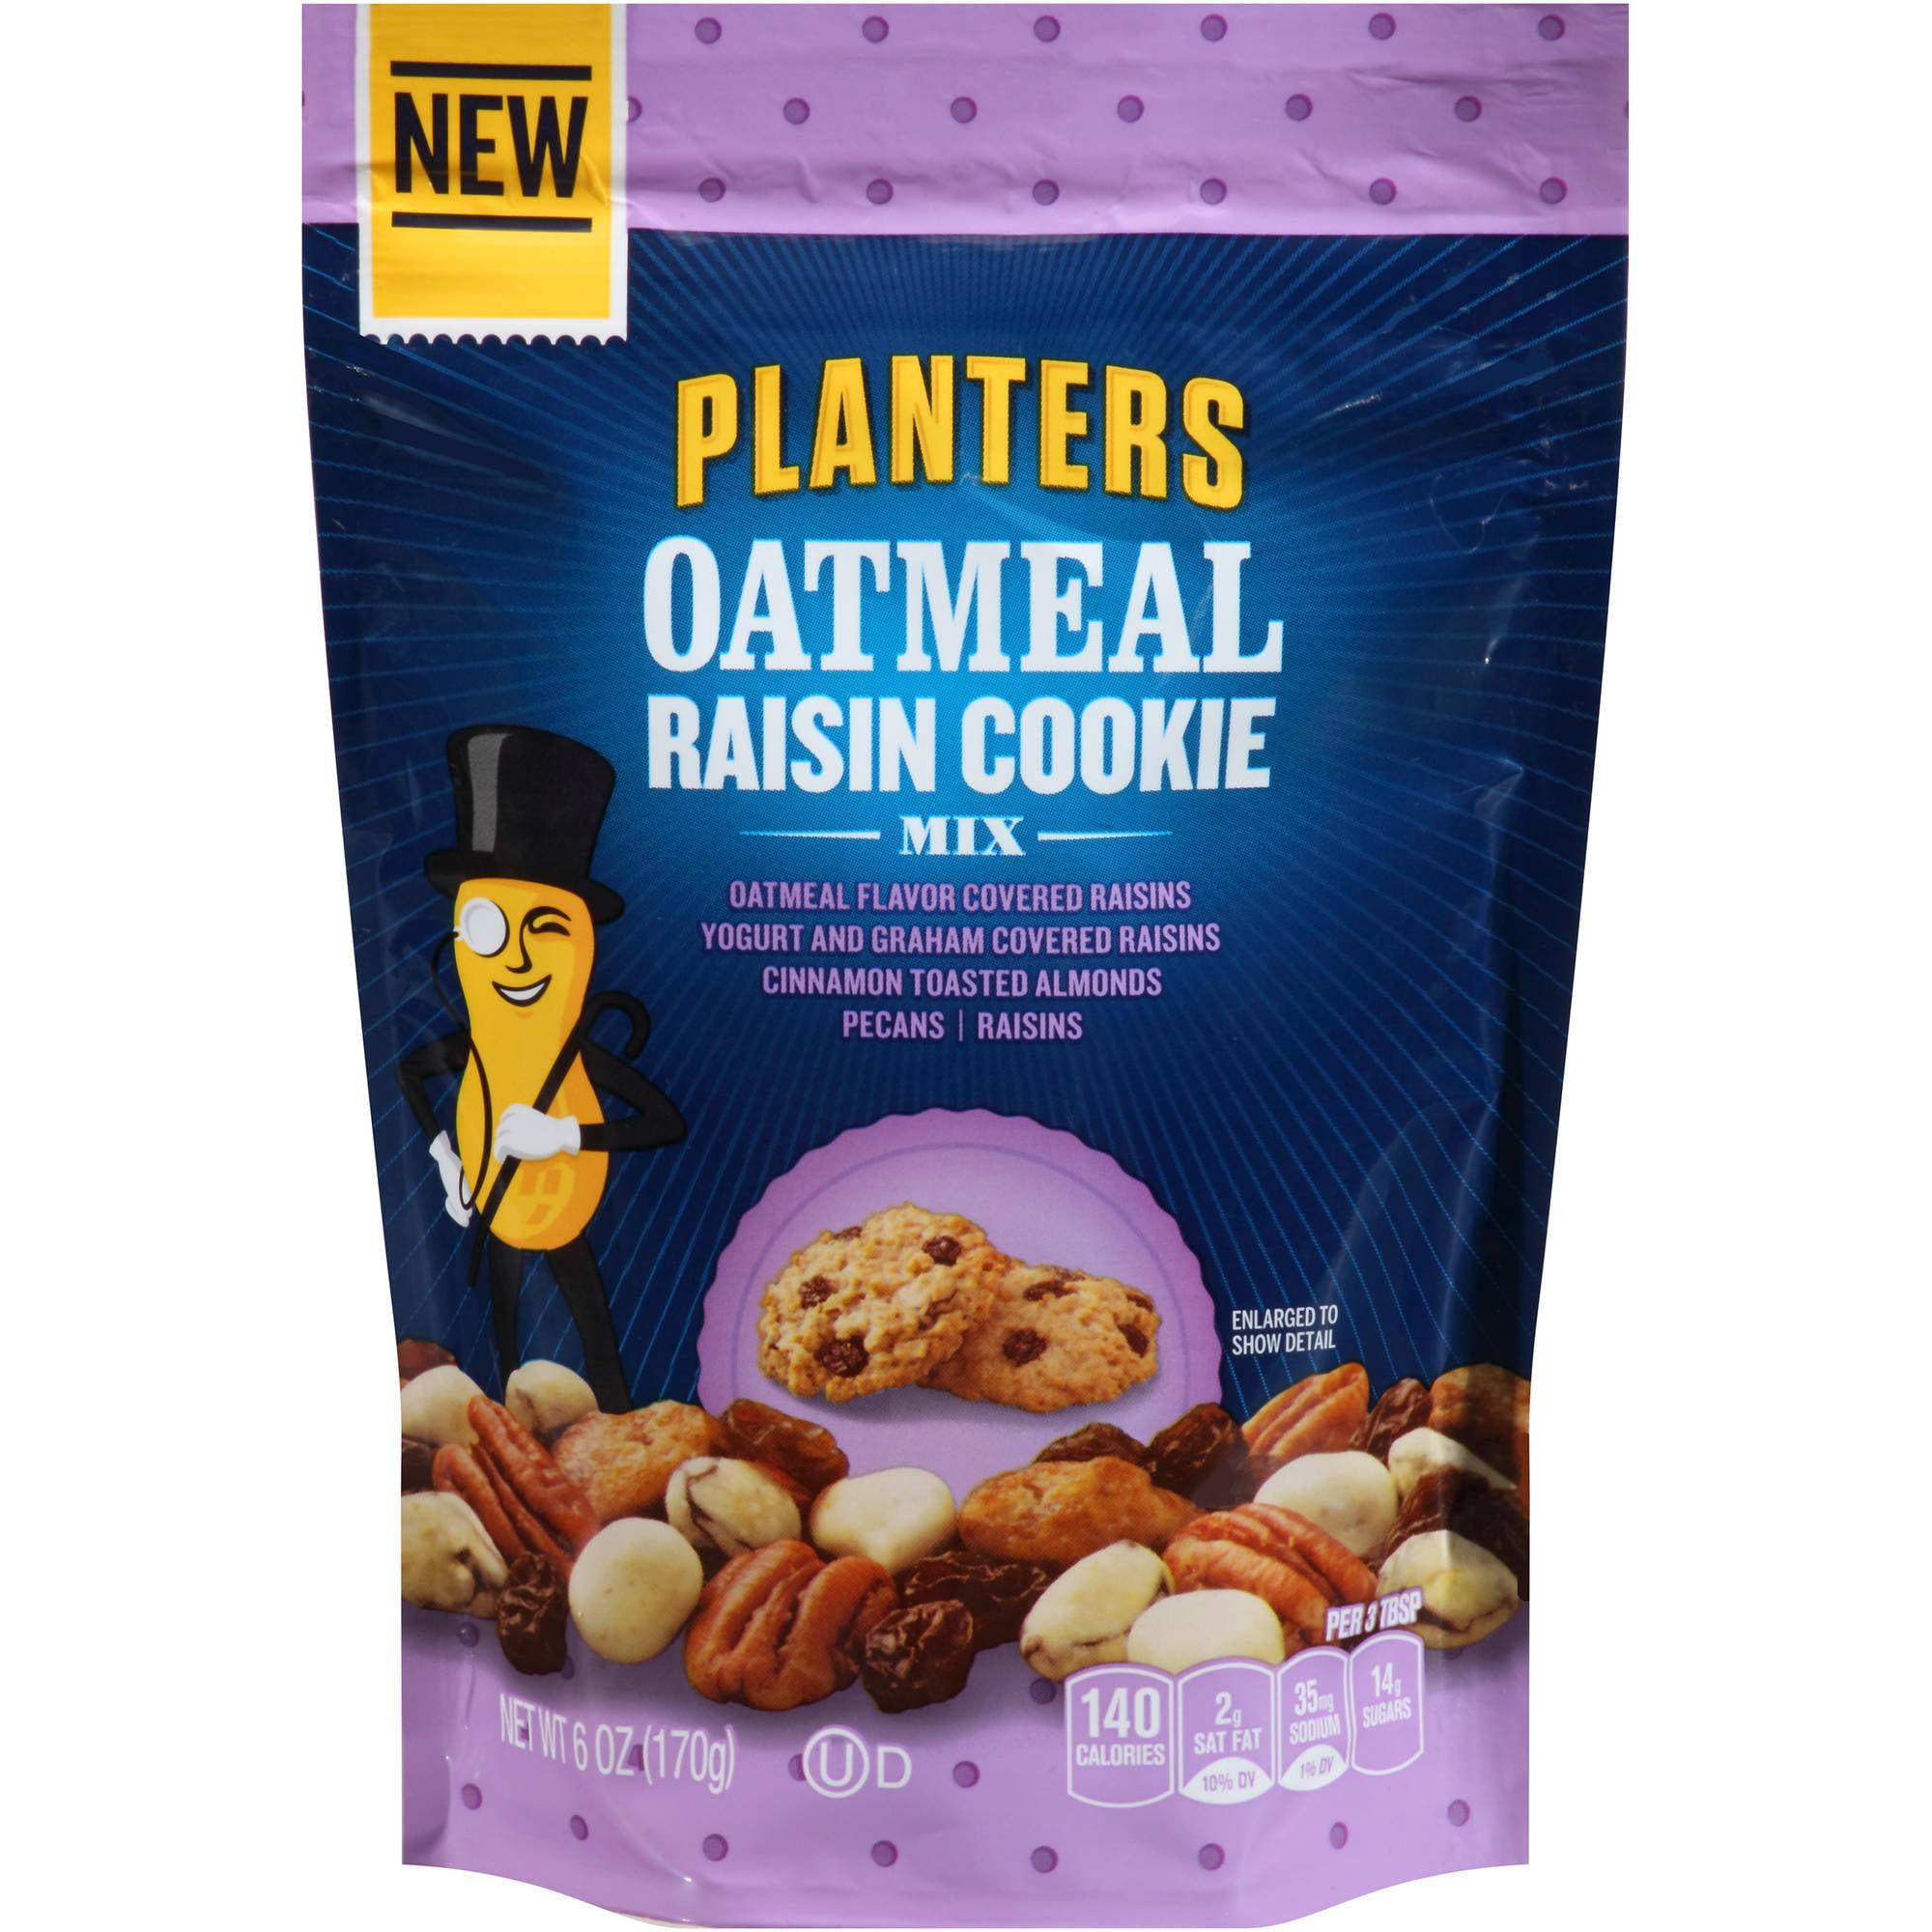 Planters Oatmeal Raisin Cookie Mix, 6 oz